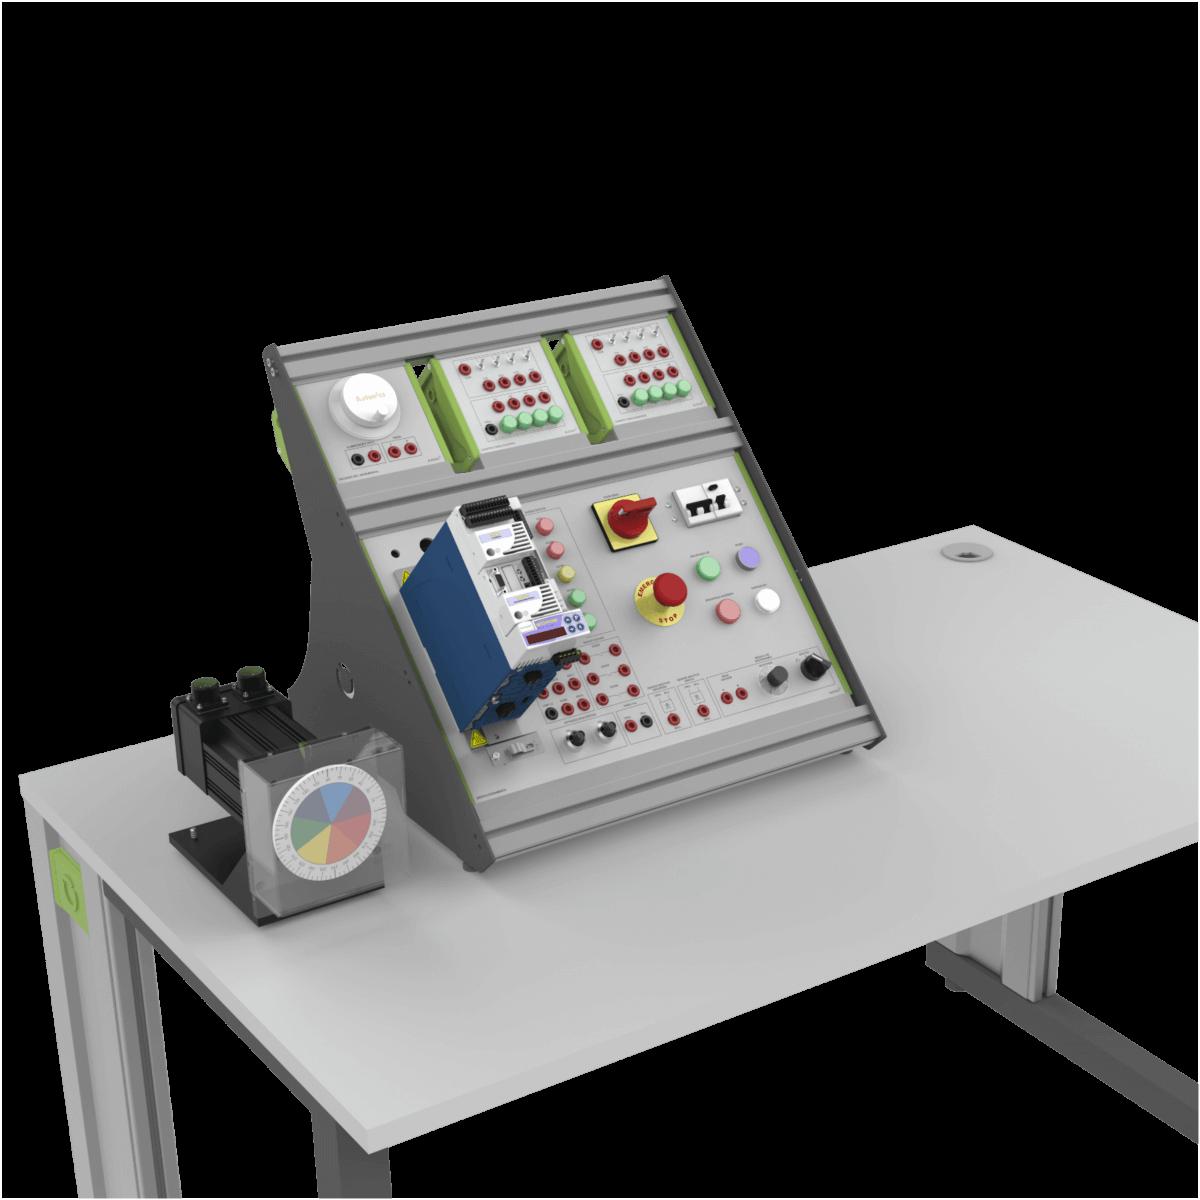 lab-motion-bancada-didatica-rack-desktop-servomotor_1-auttom-5